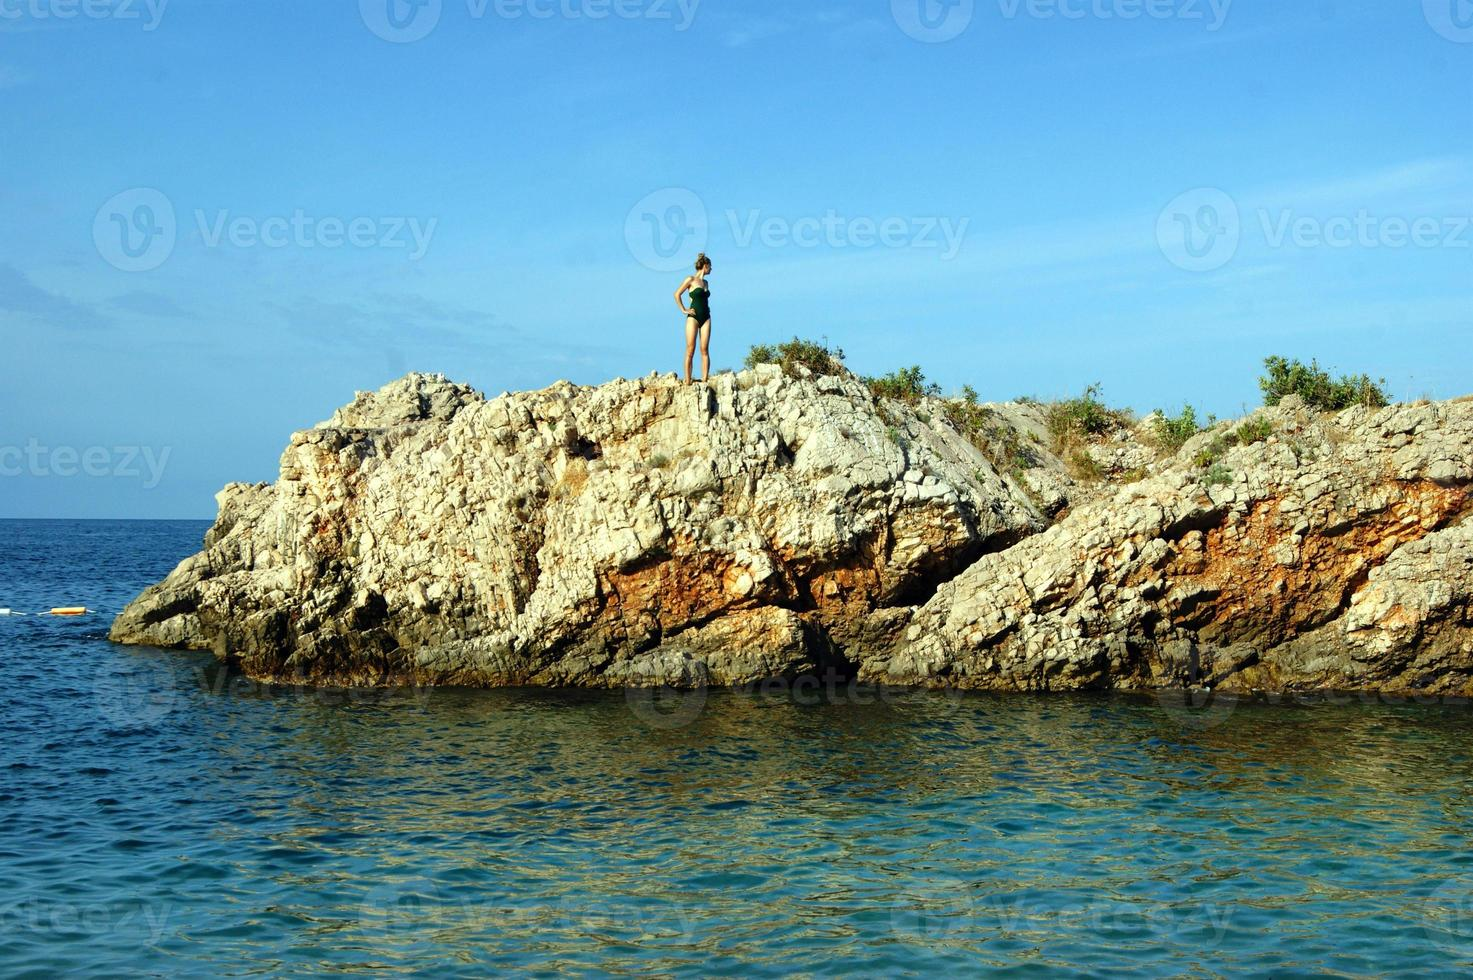 die Felseninsel im adriatischen Meer foto